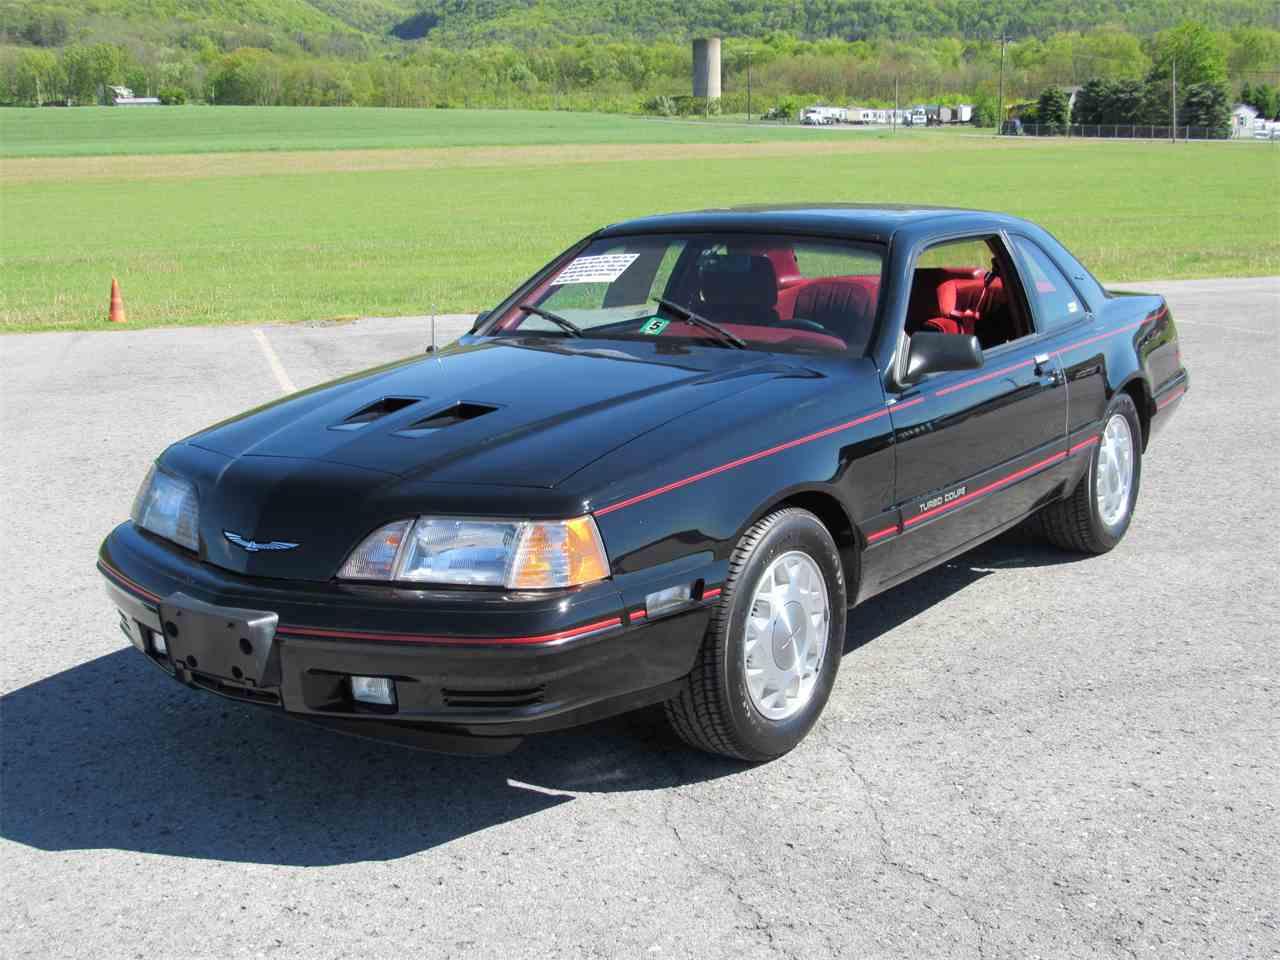 1988 Ford Thunderbird for Sale on ClassicCarscom  1 Available